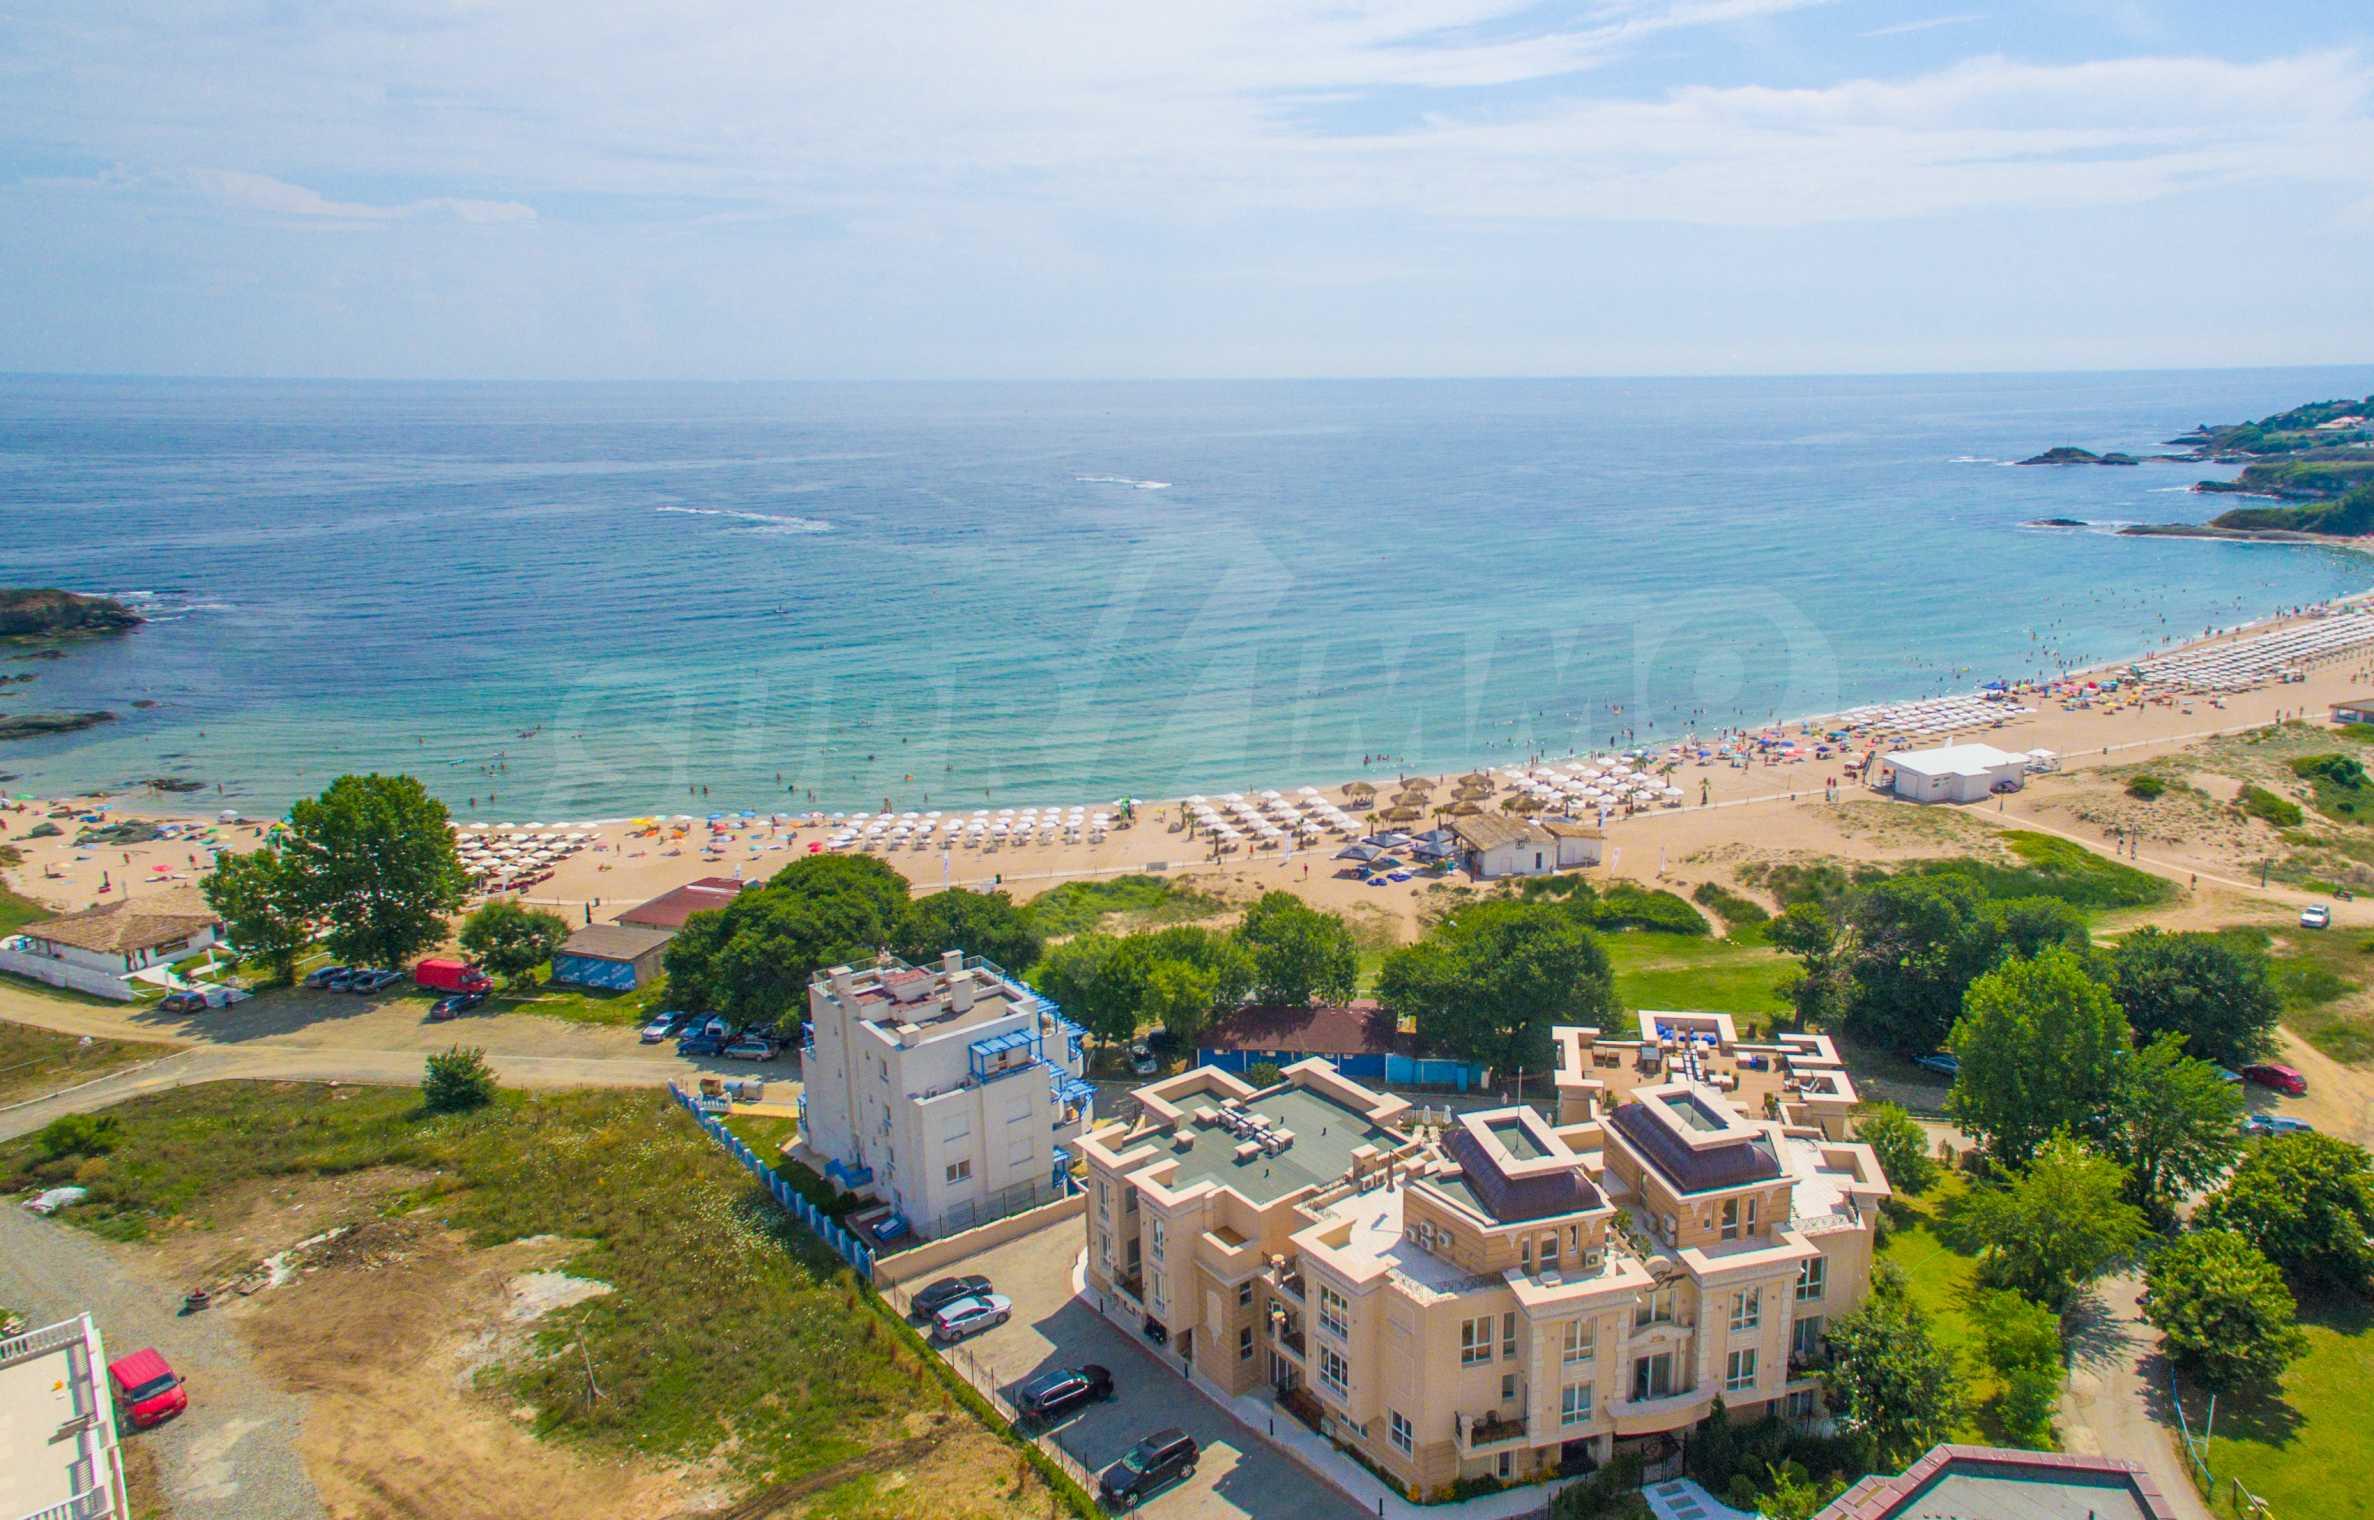 Exclusive 2-bedroom beachfront apartment in the prestigious Belle Époque Beach Residence 52